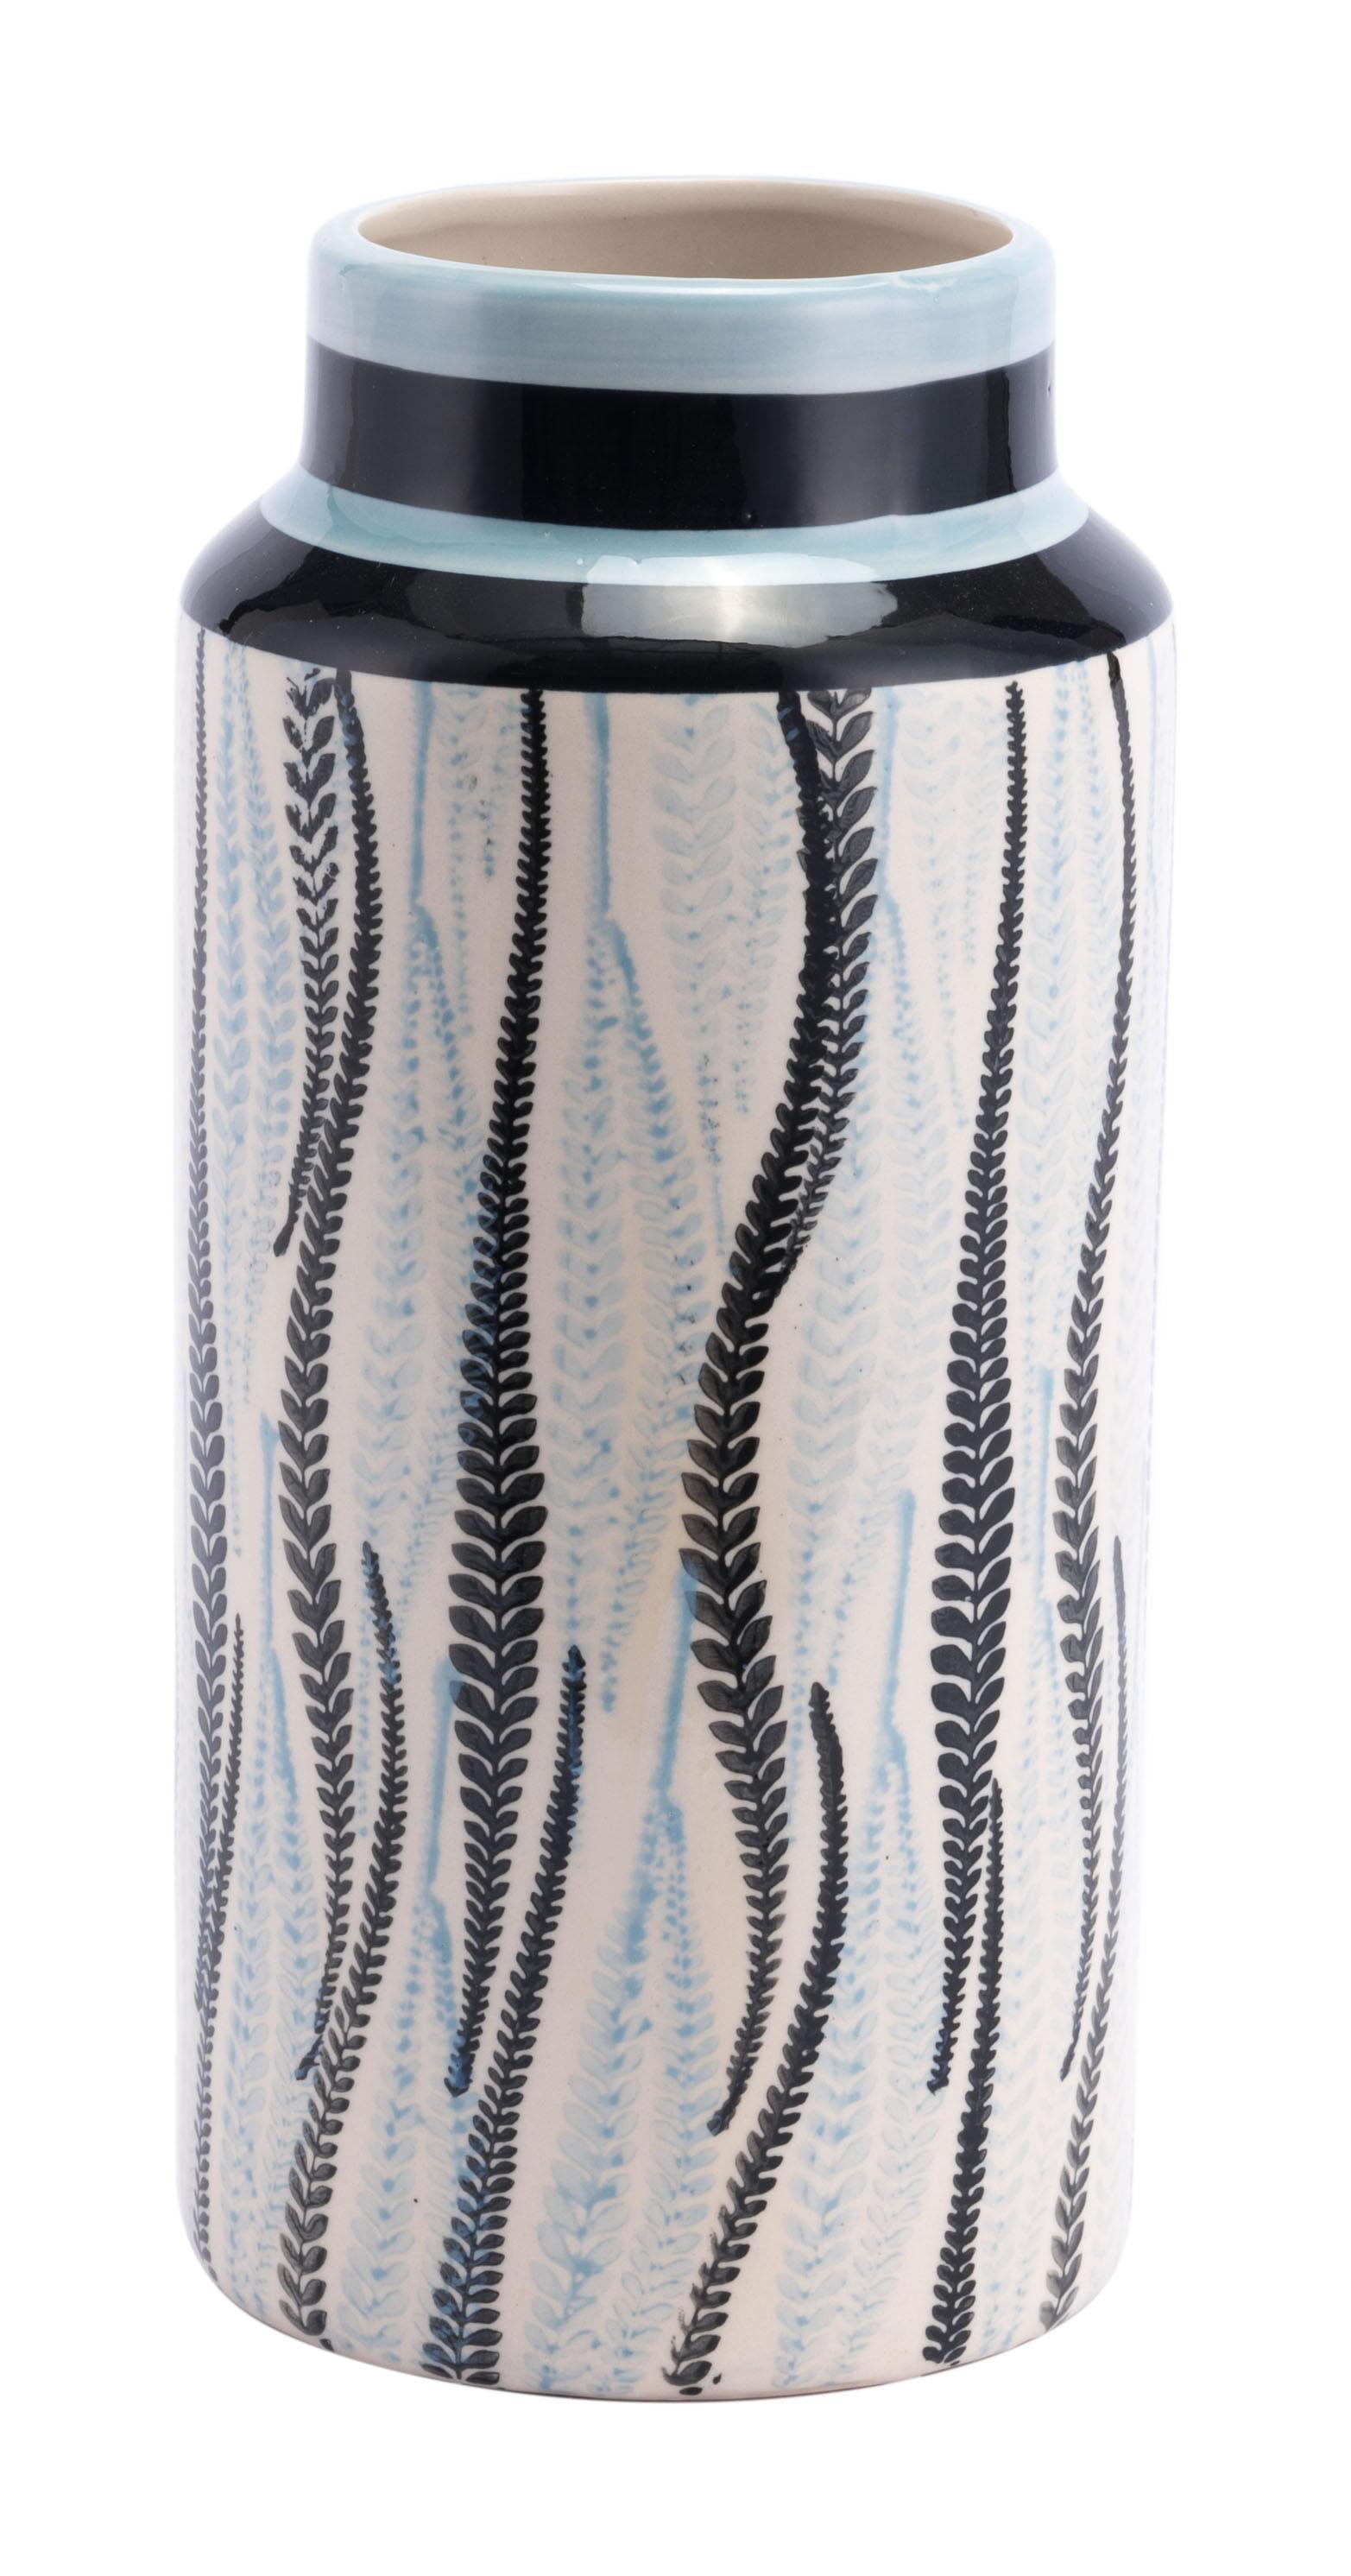 "5.5"" x 5.5"" x 11.4"" White & Black, Ceramic, Small Vase"